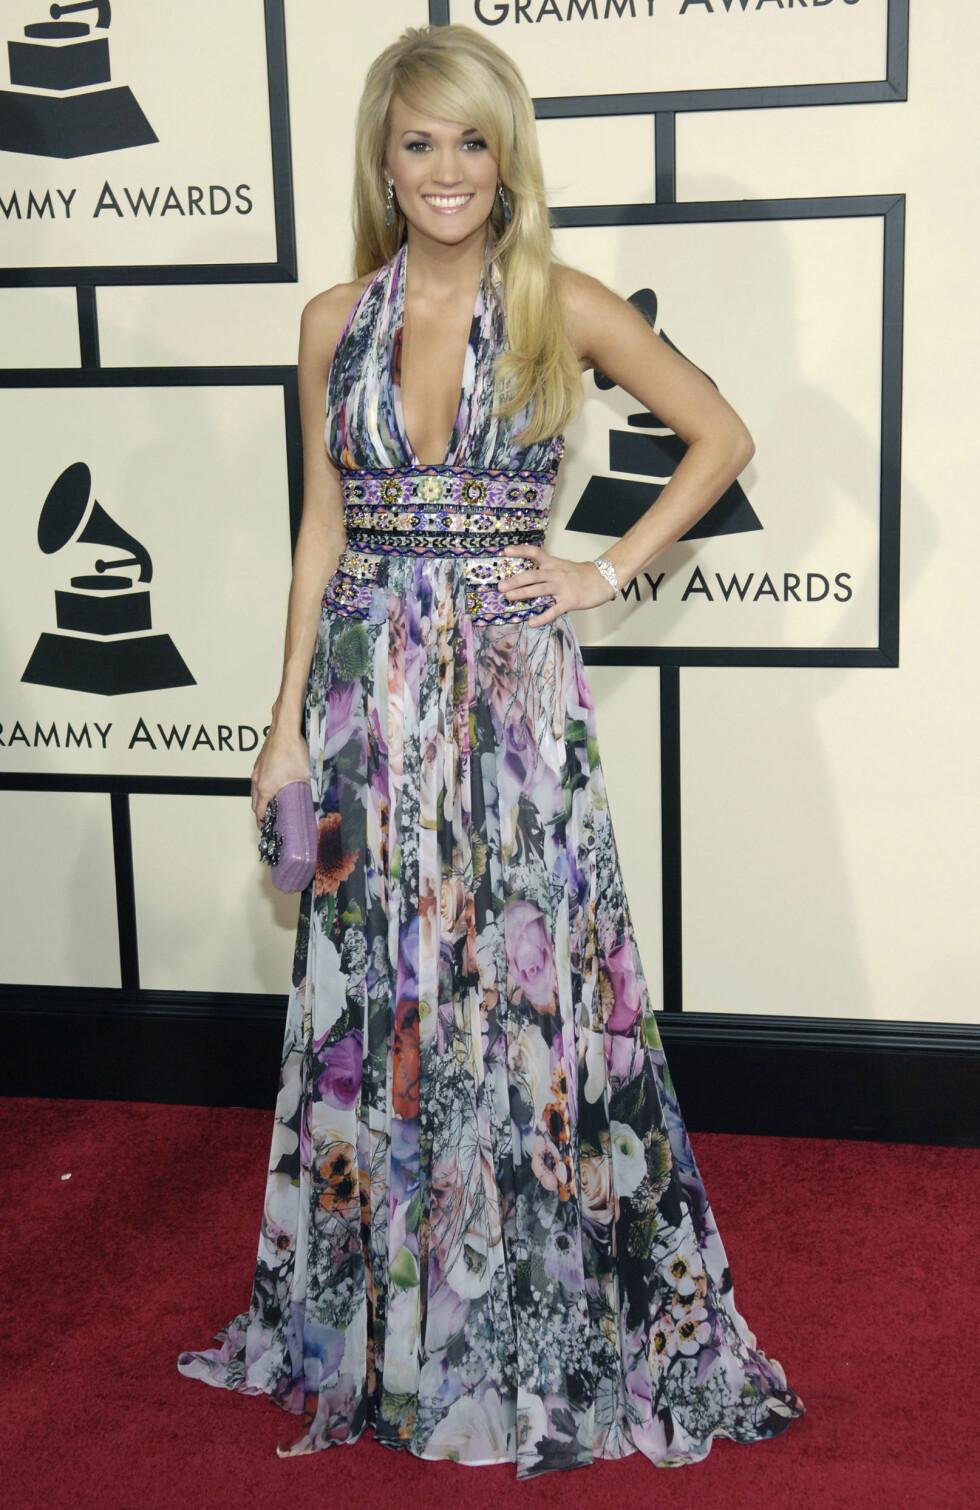 VANT PRIS: Country-artisten Carrie Underwood vant i kategorien Best Female Country Vocal Performance for låten Before He Cheats. Foto: NTB Scanpix